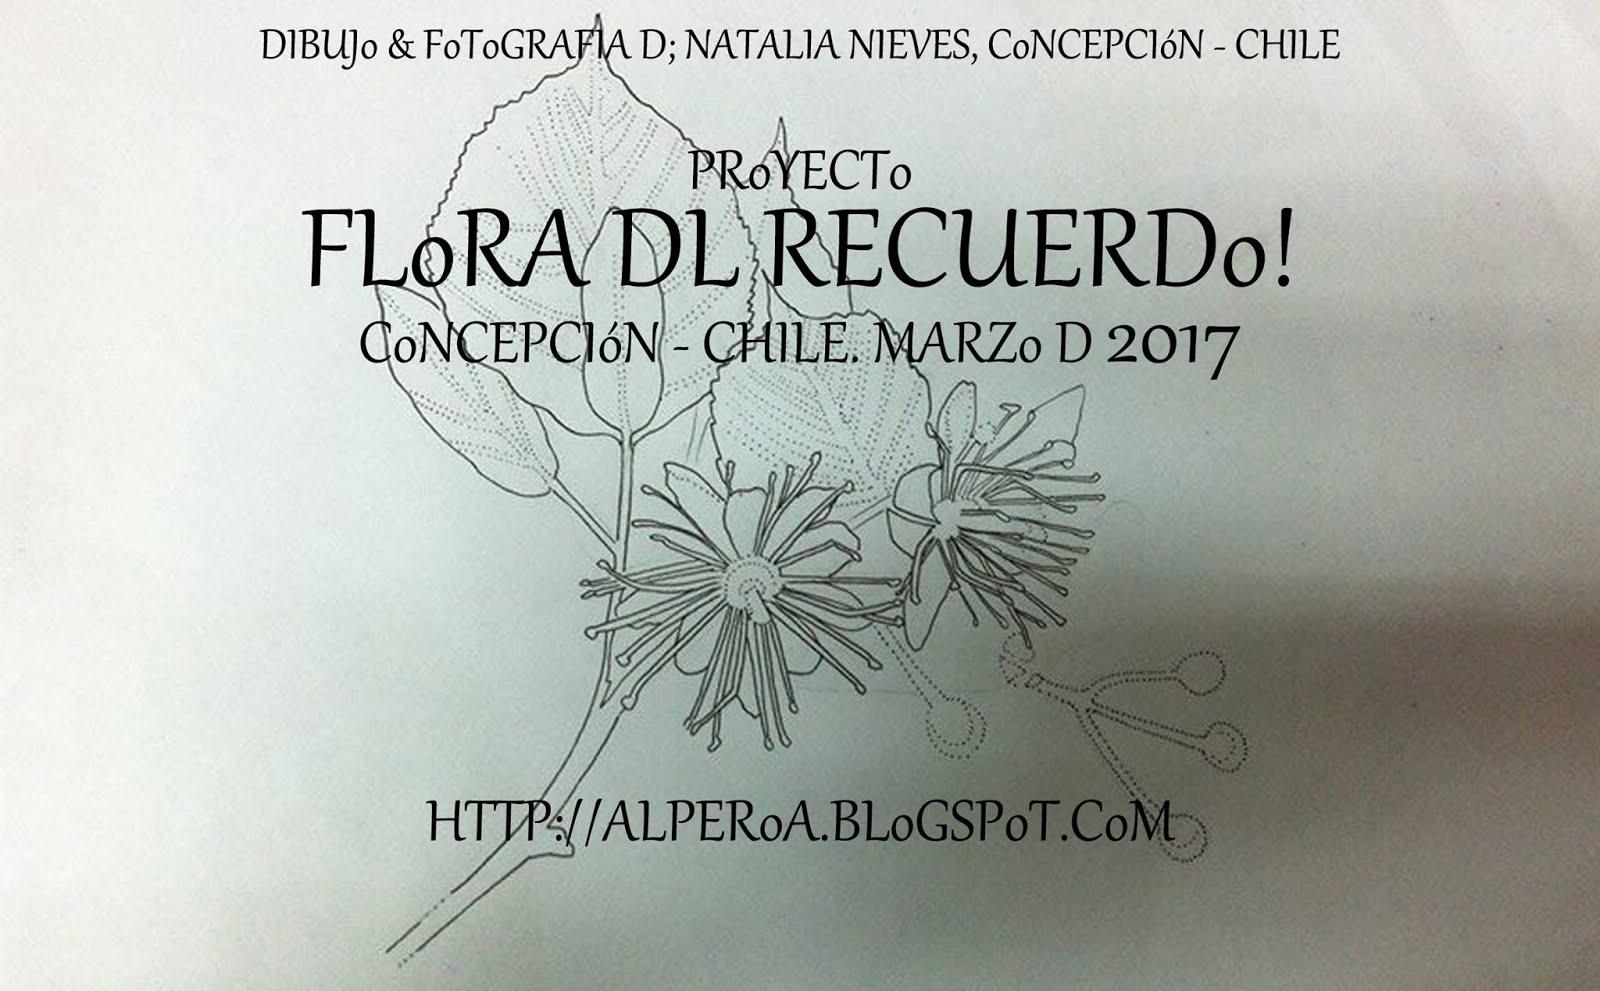 PRoYECTo FLoRA DL RECUERDo!